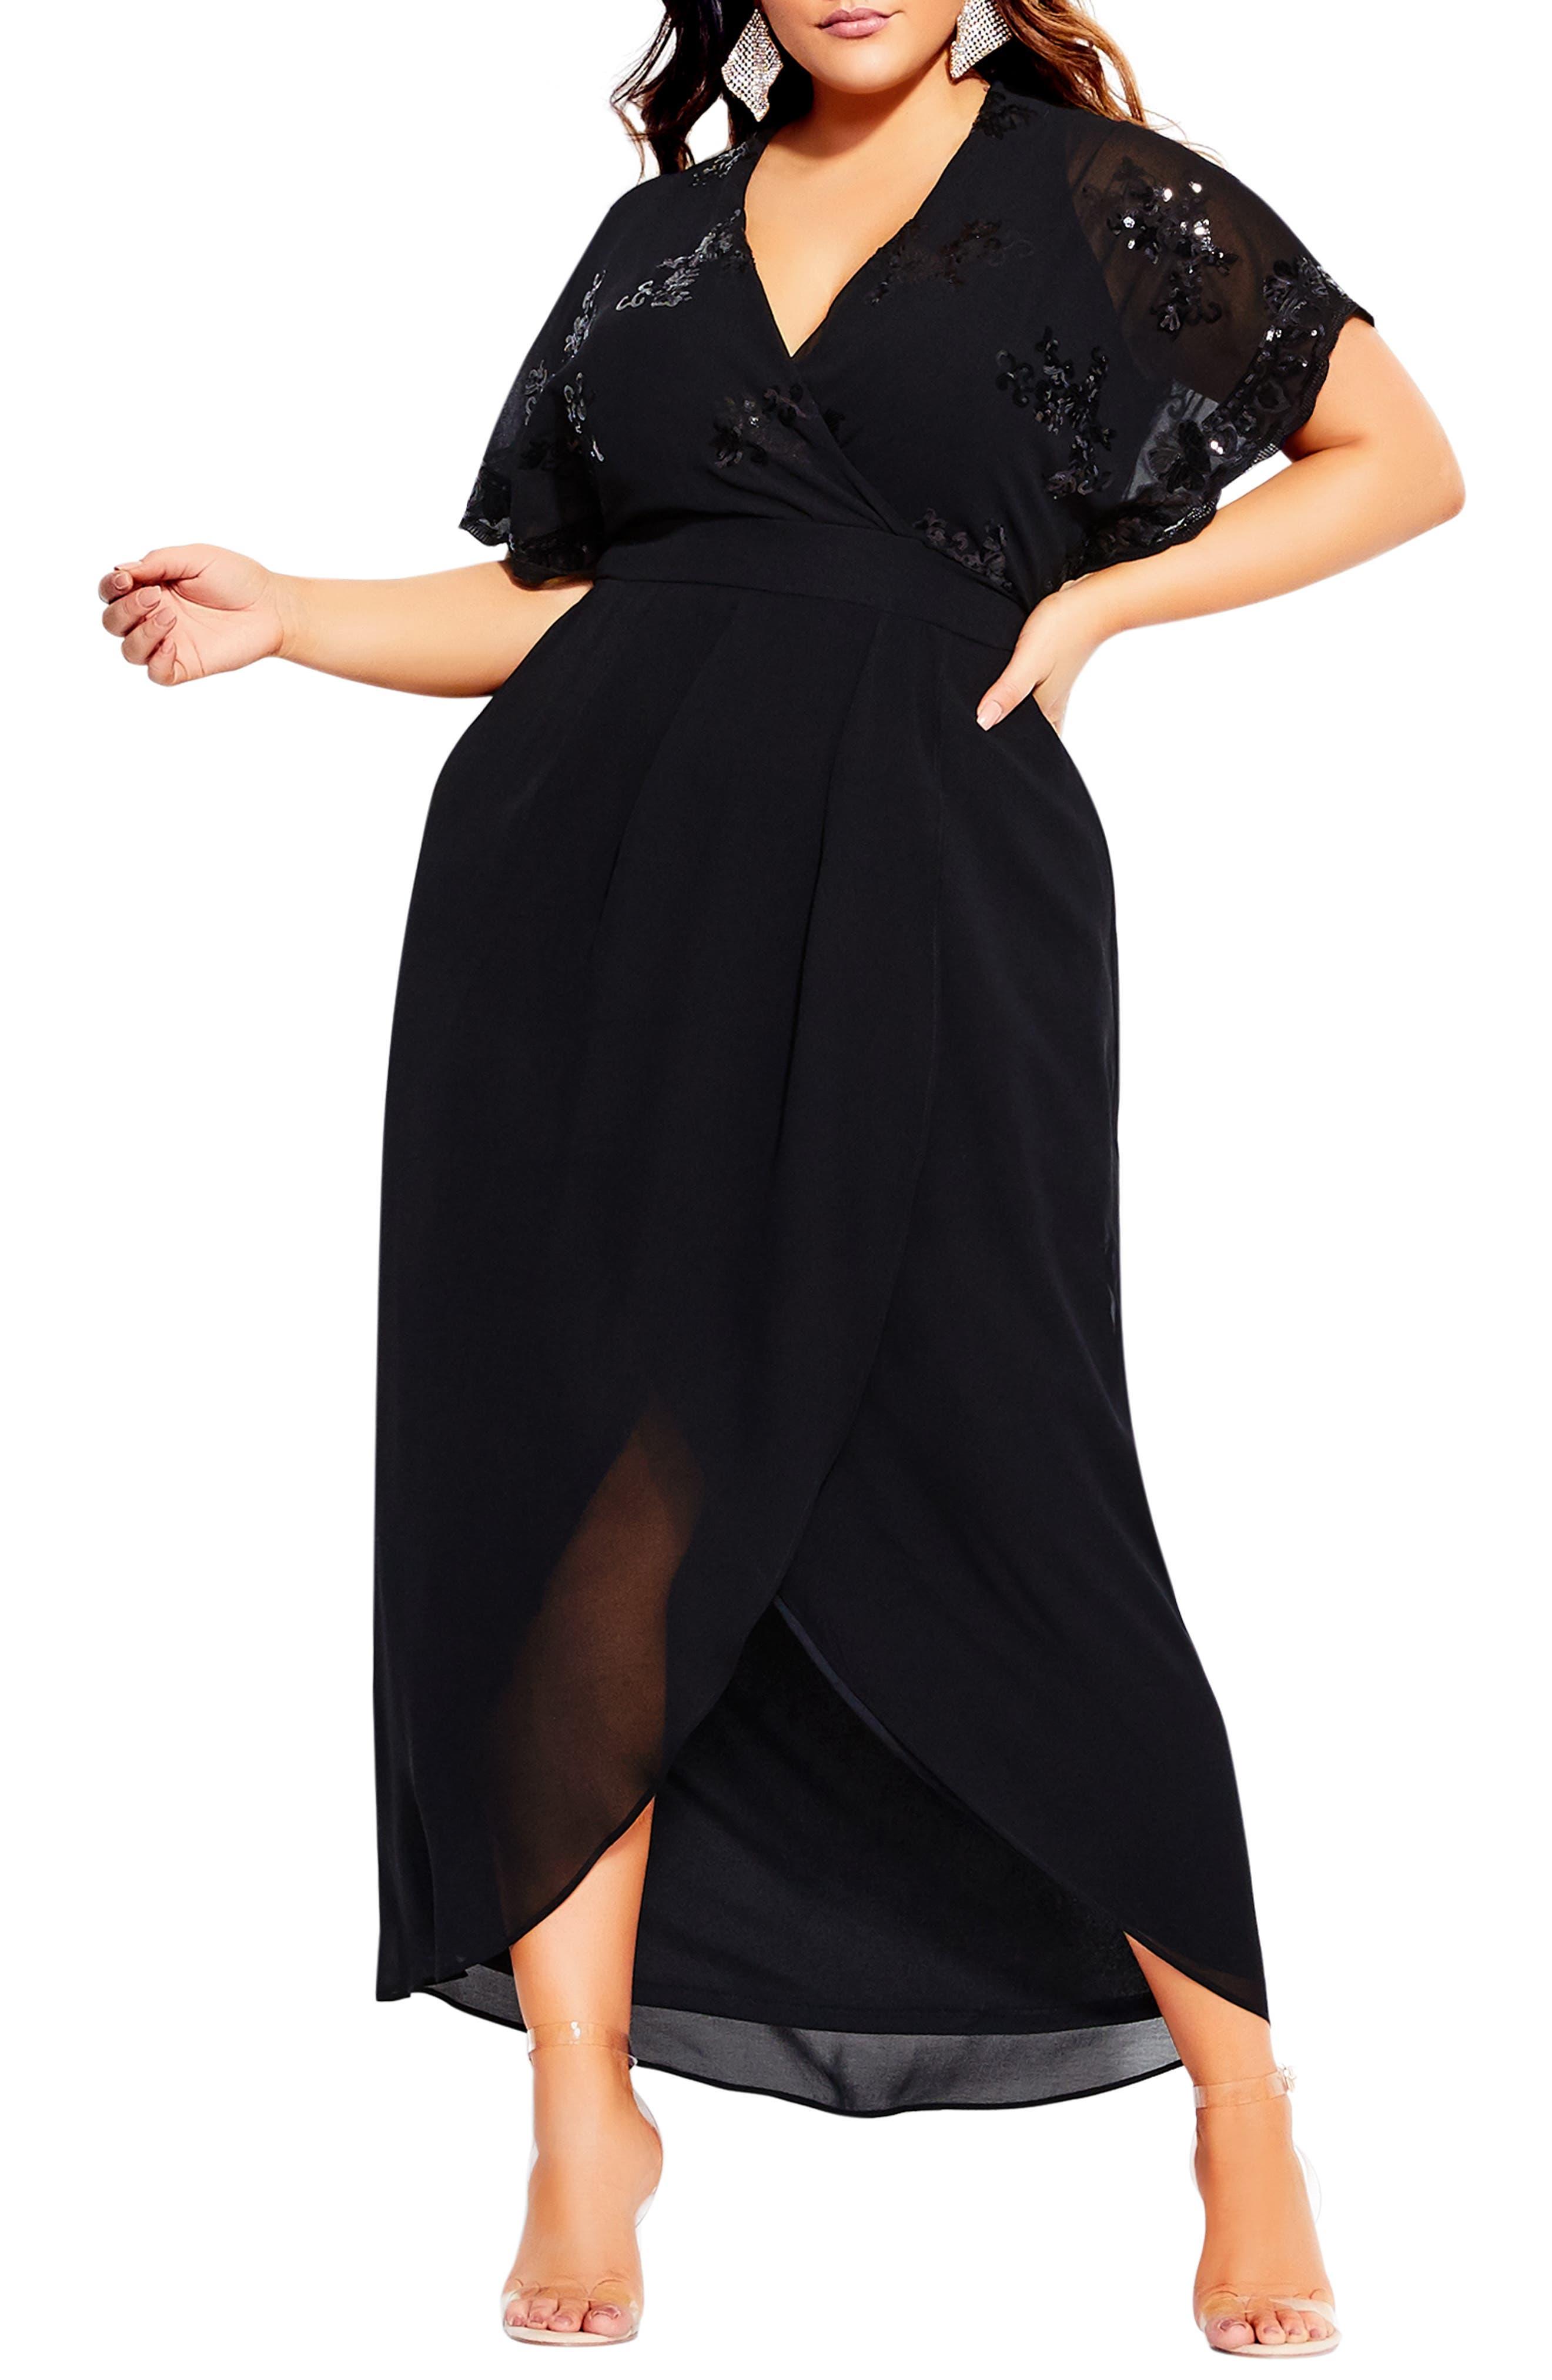 70s Prom, Formal, Evening, Party Dresses Plus Size Womens City Chic Sequin Bodice Faux Wrap Maxi Dress $139.00 AT vintagedancer.com